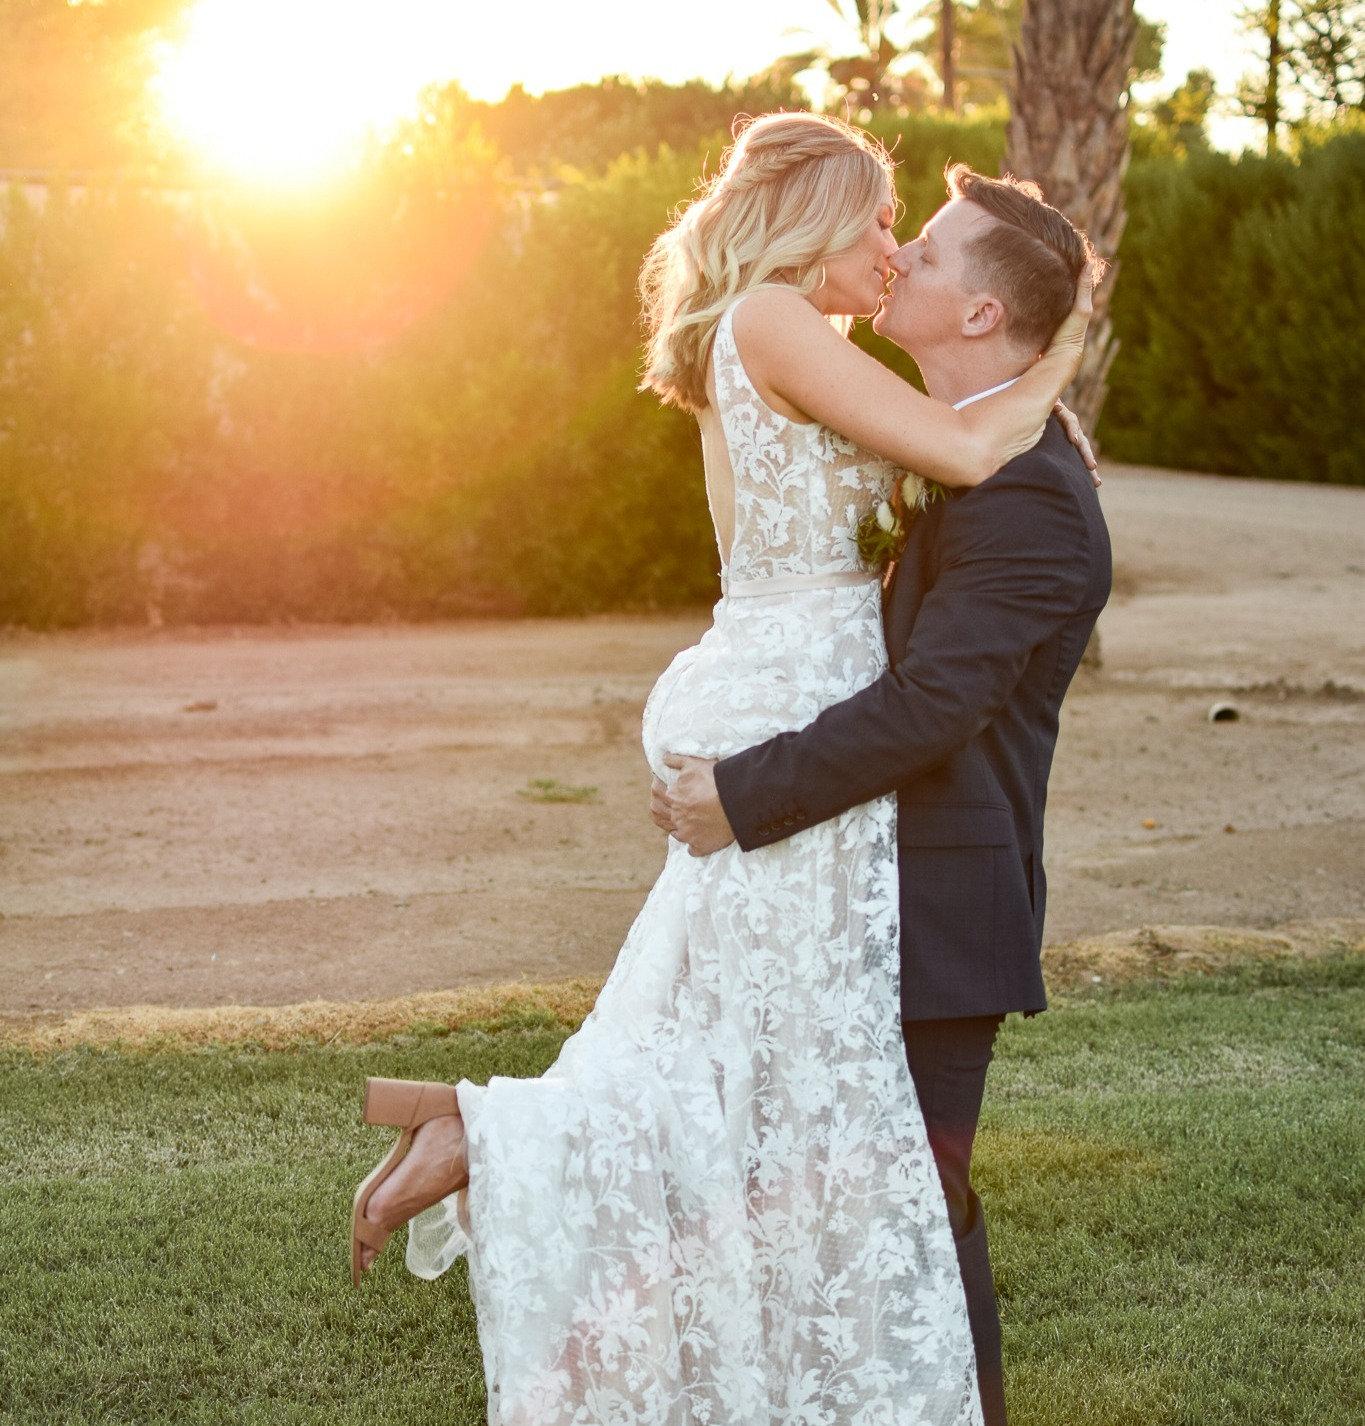 Engagement or Couples Romance Photos